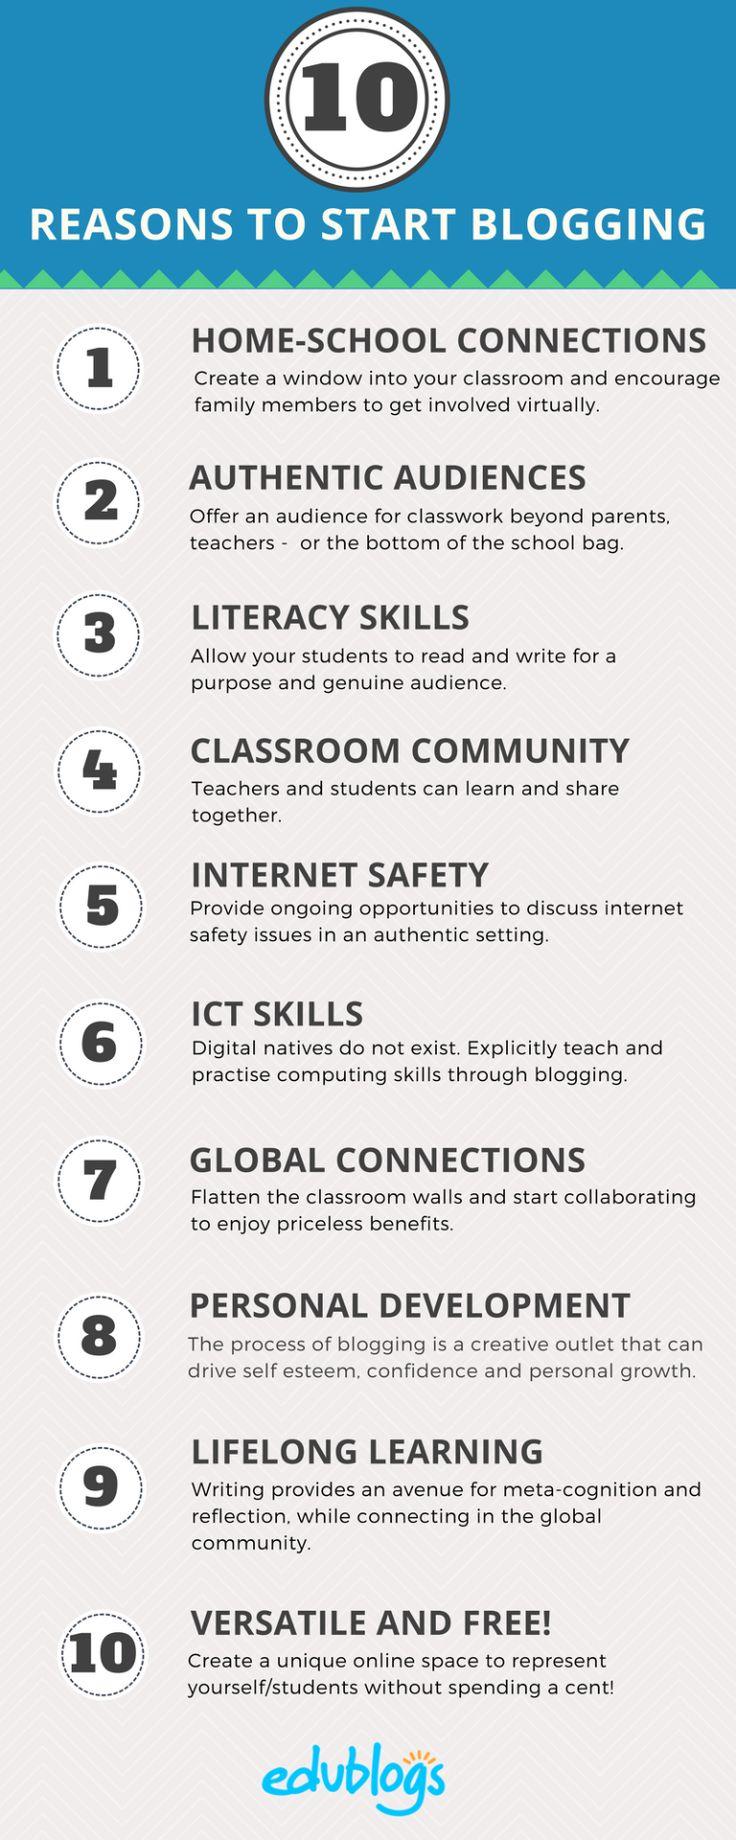 Ten Reasons Educators Should Start Blogging | Benefits of Blogging | Edublogs